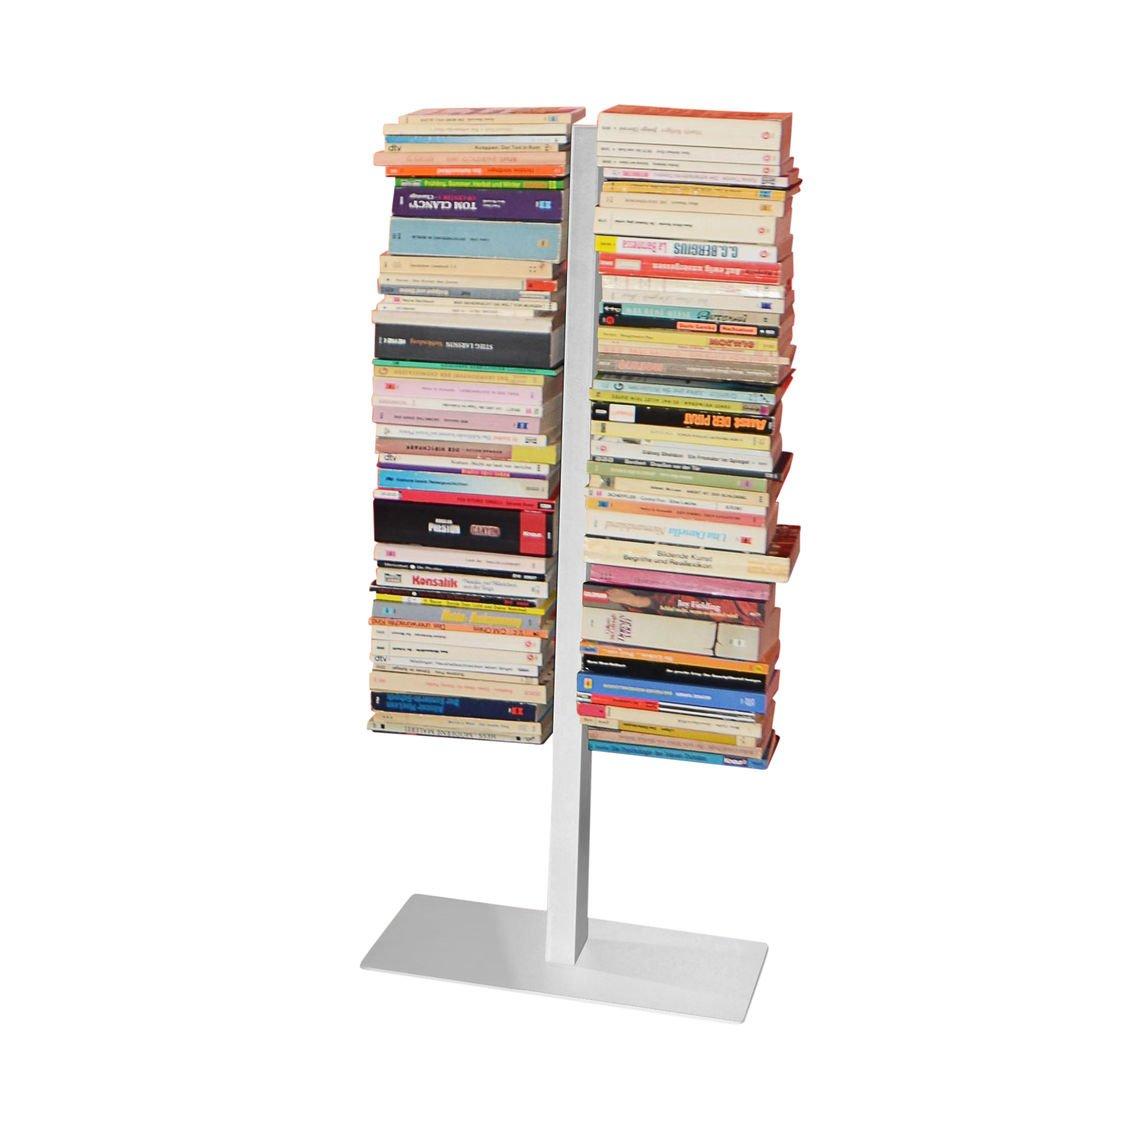 booksbaum boekenrek klein radius. Black Bedroom Furniture Sets. Home Design Ideas